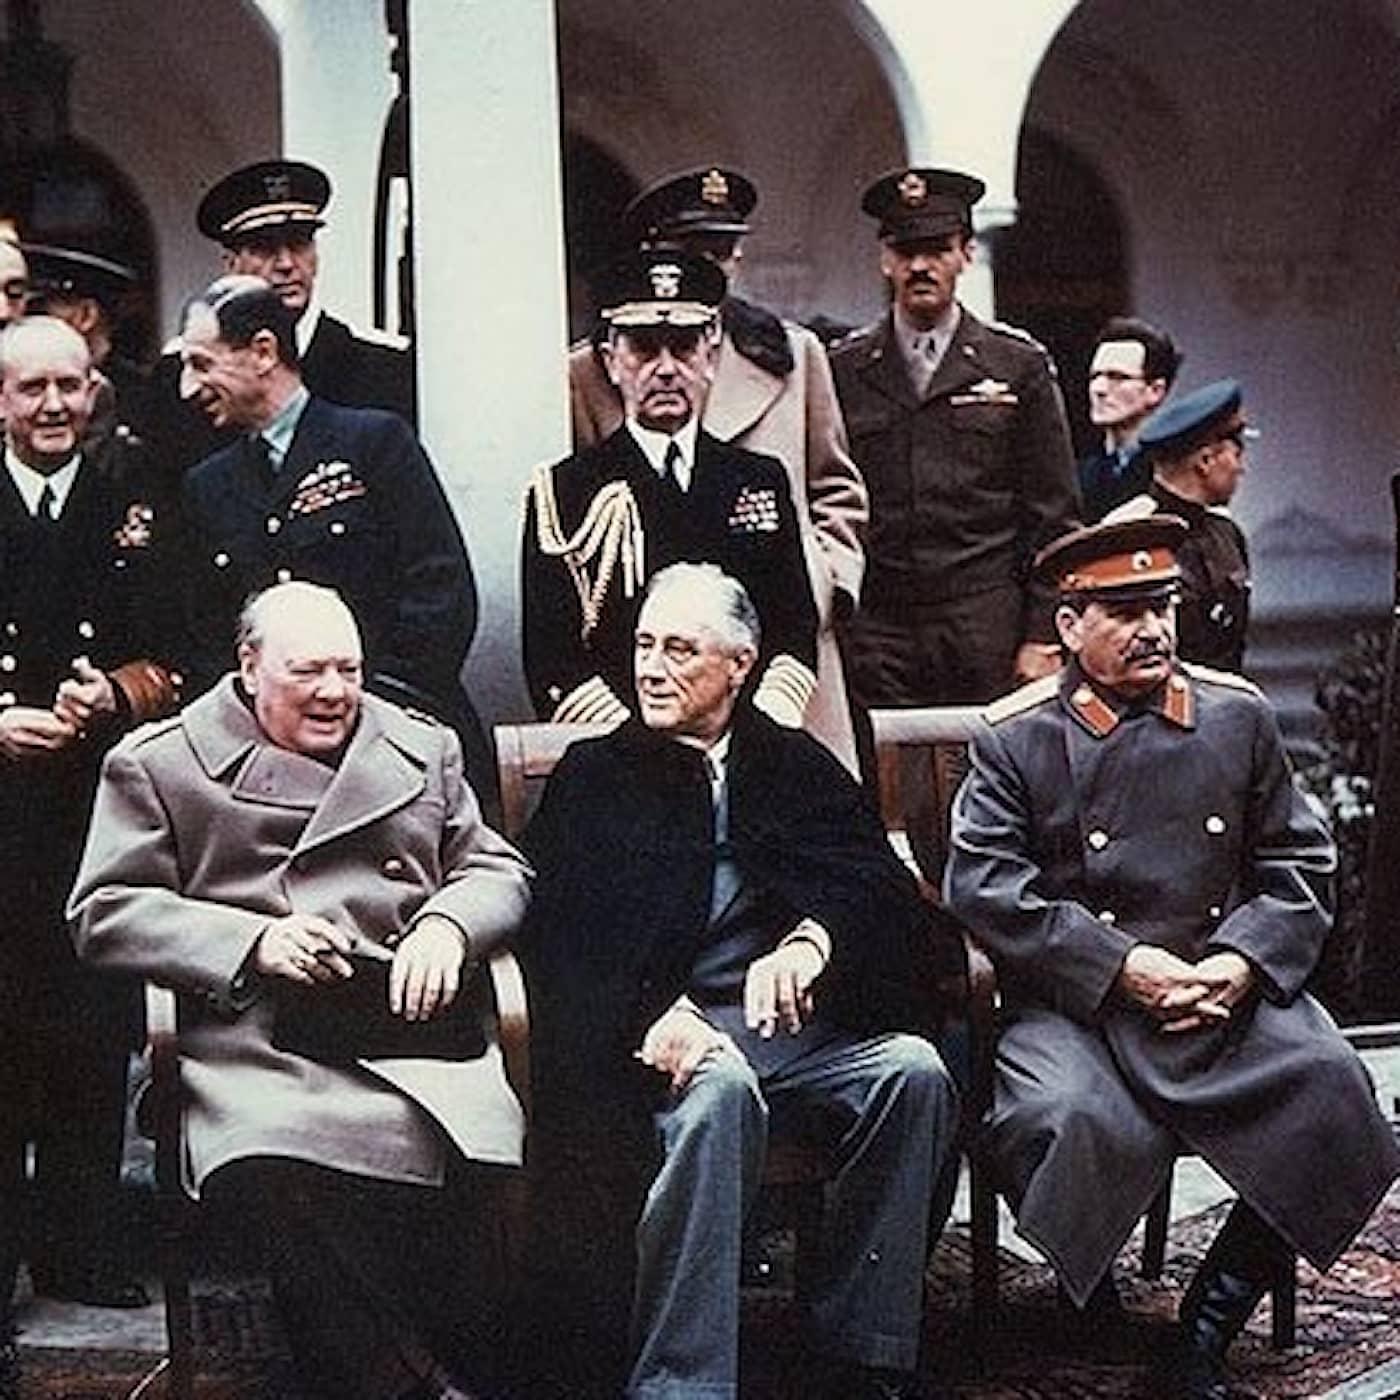 Jaltakonferensen 1945 beseglade världens öde